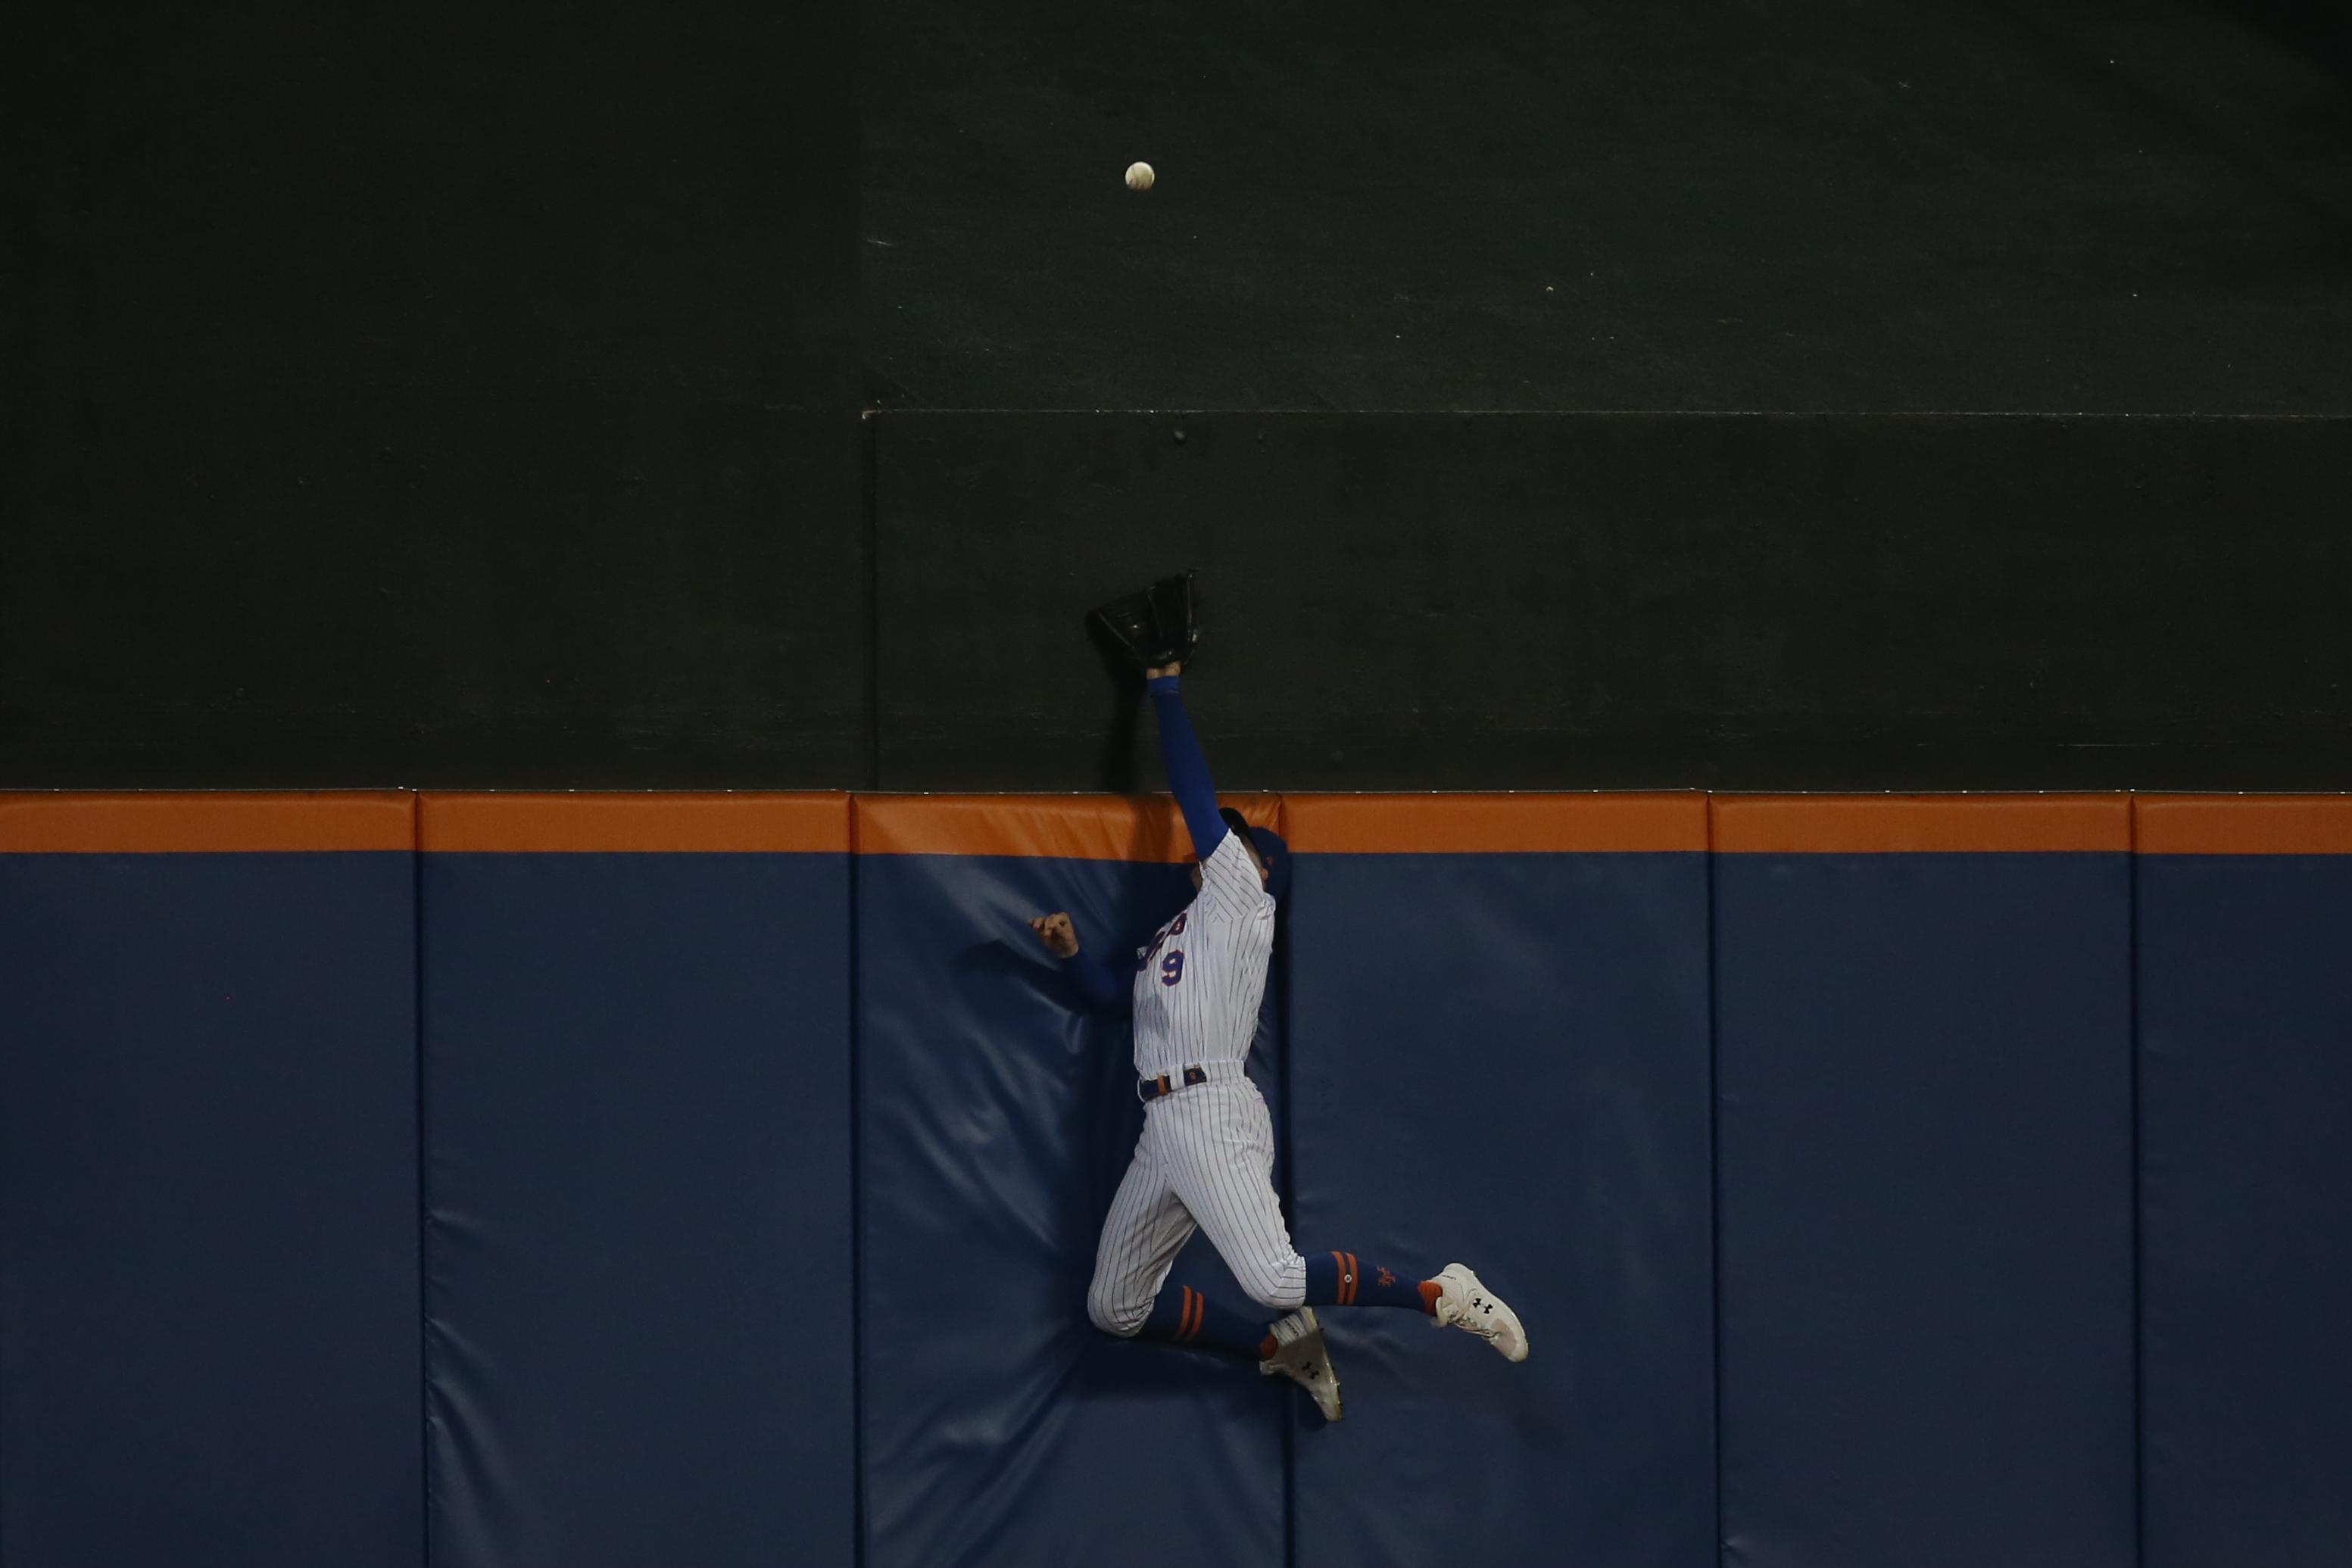 7/29/21 Game Preview: Atlanta Braves at New York Mets